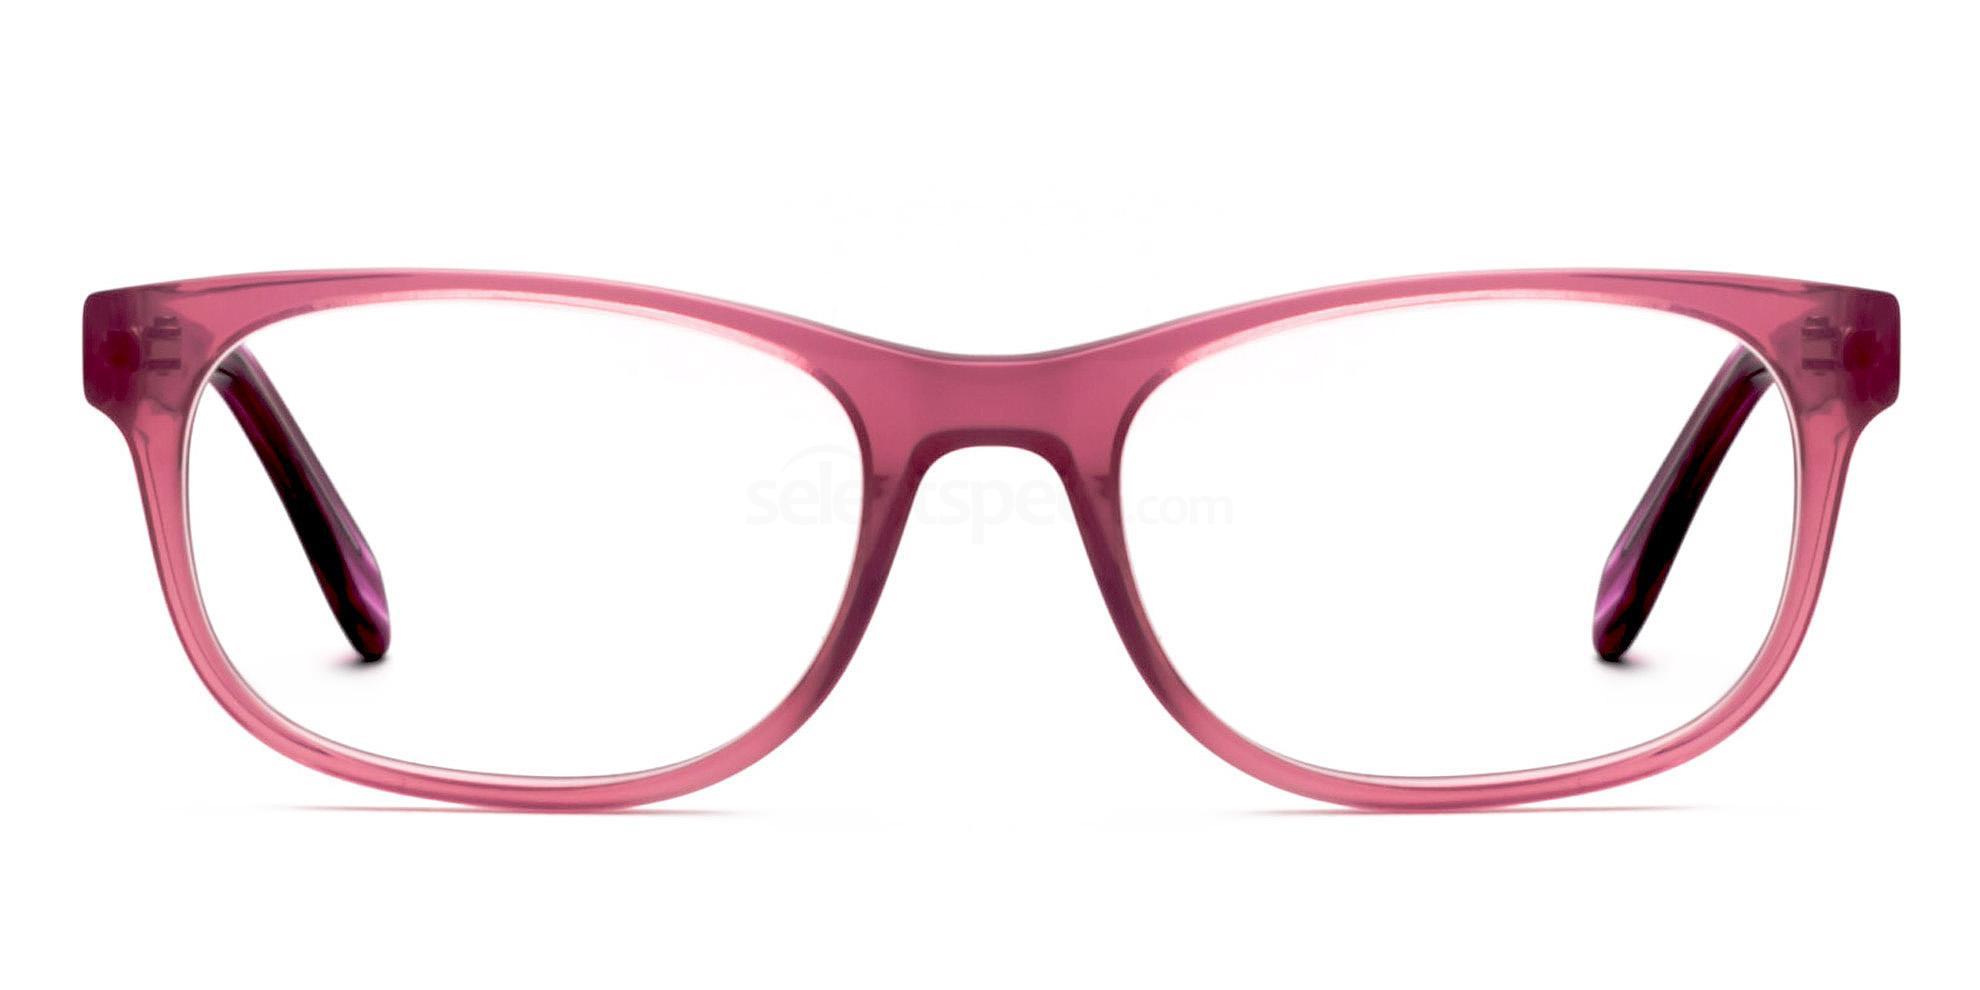 089 1613 Glasses, Hallmark